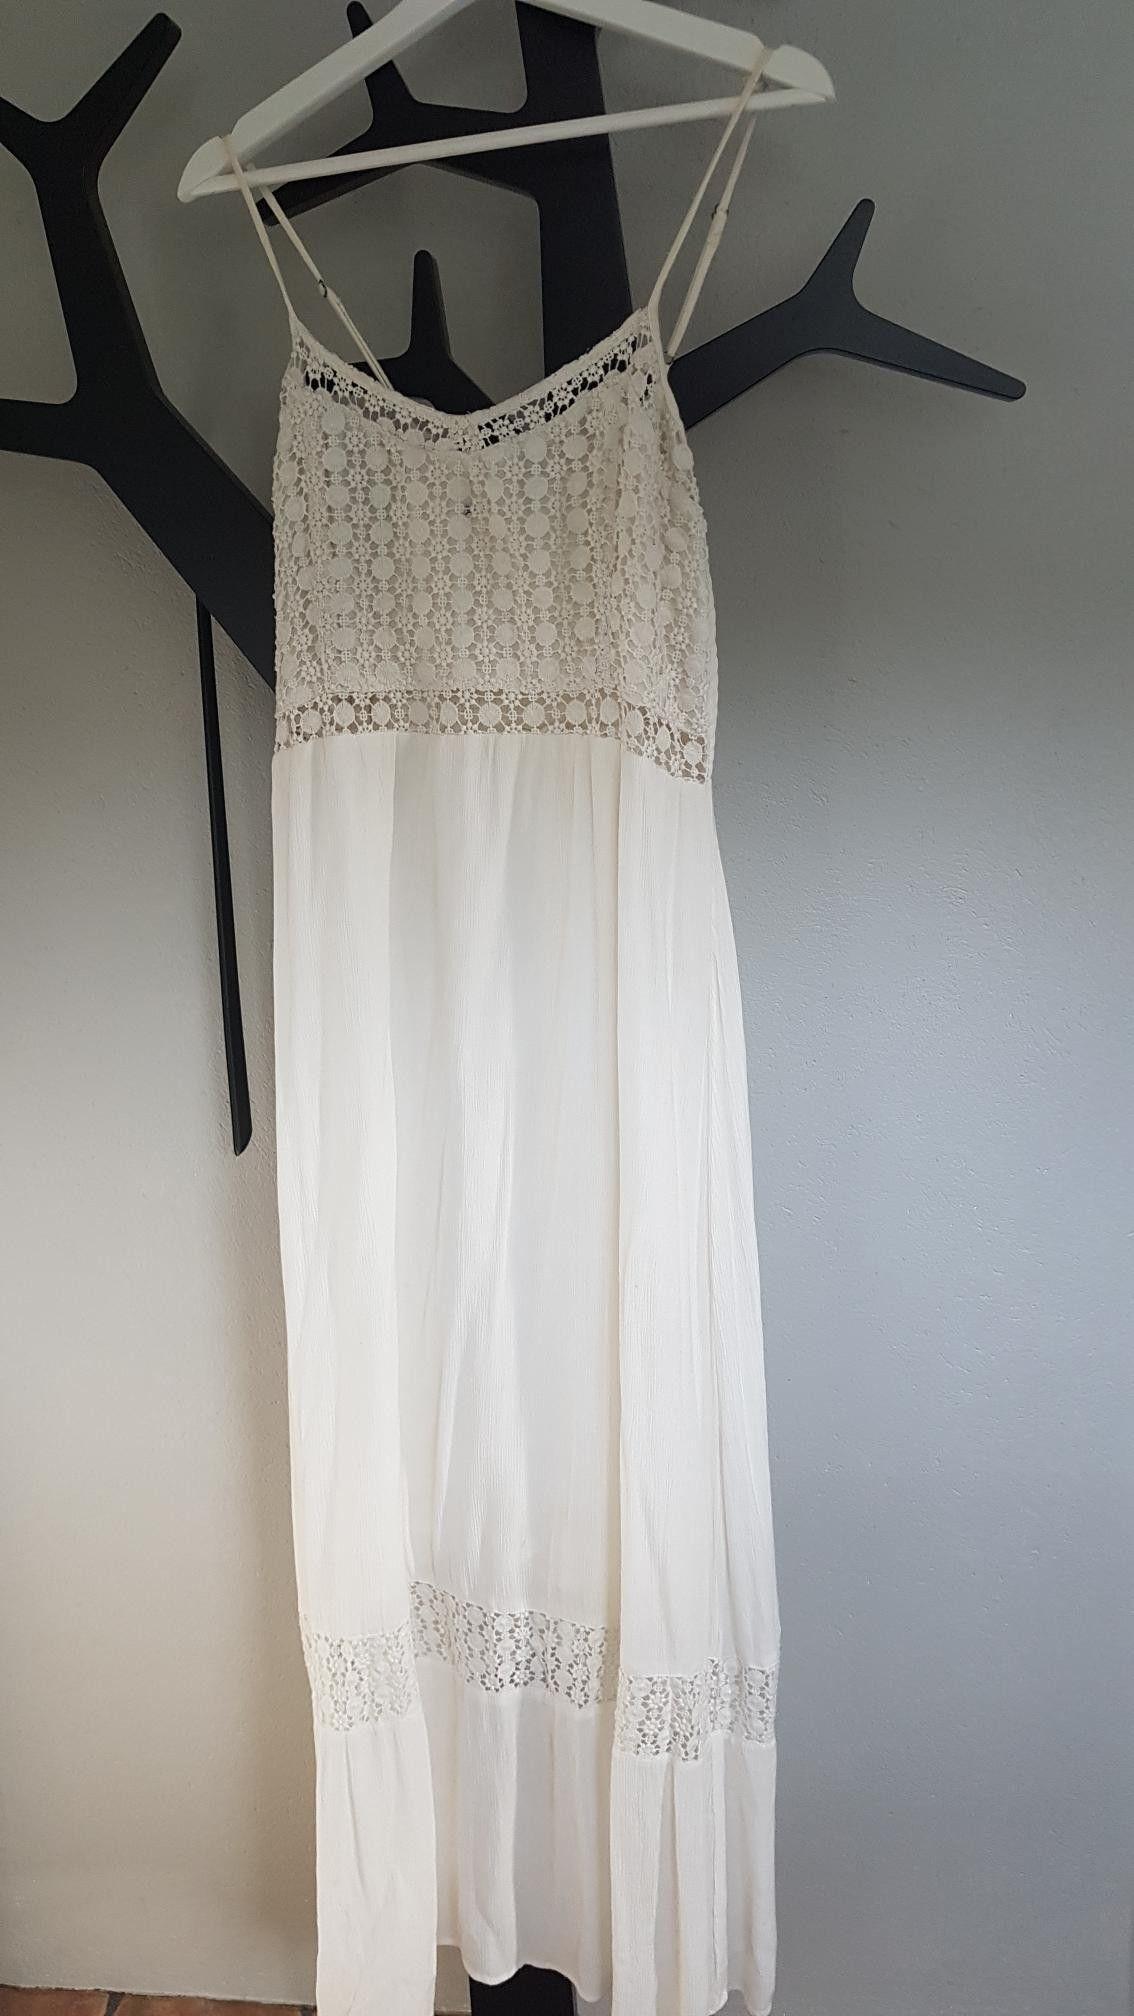 d0a2b10ff289 United colors of Benetton kjole